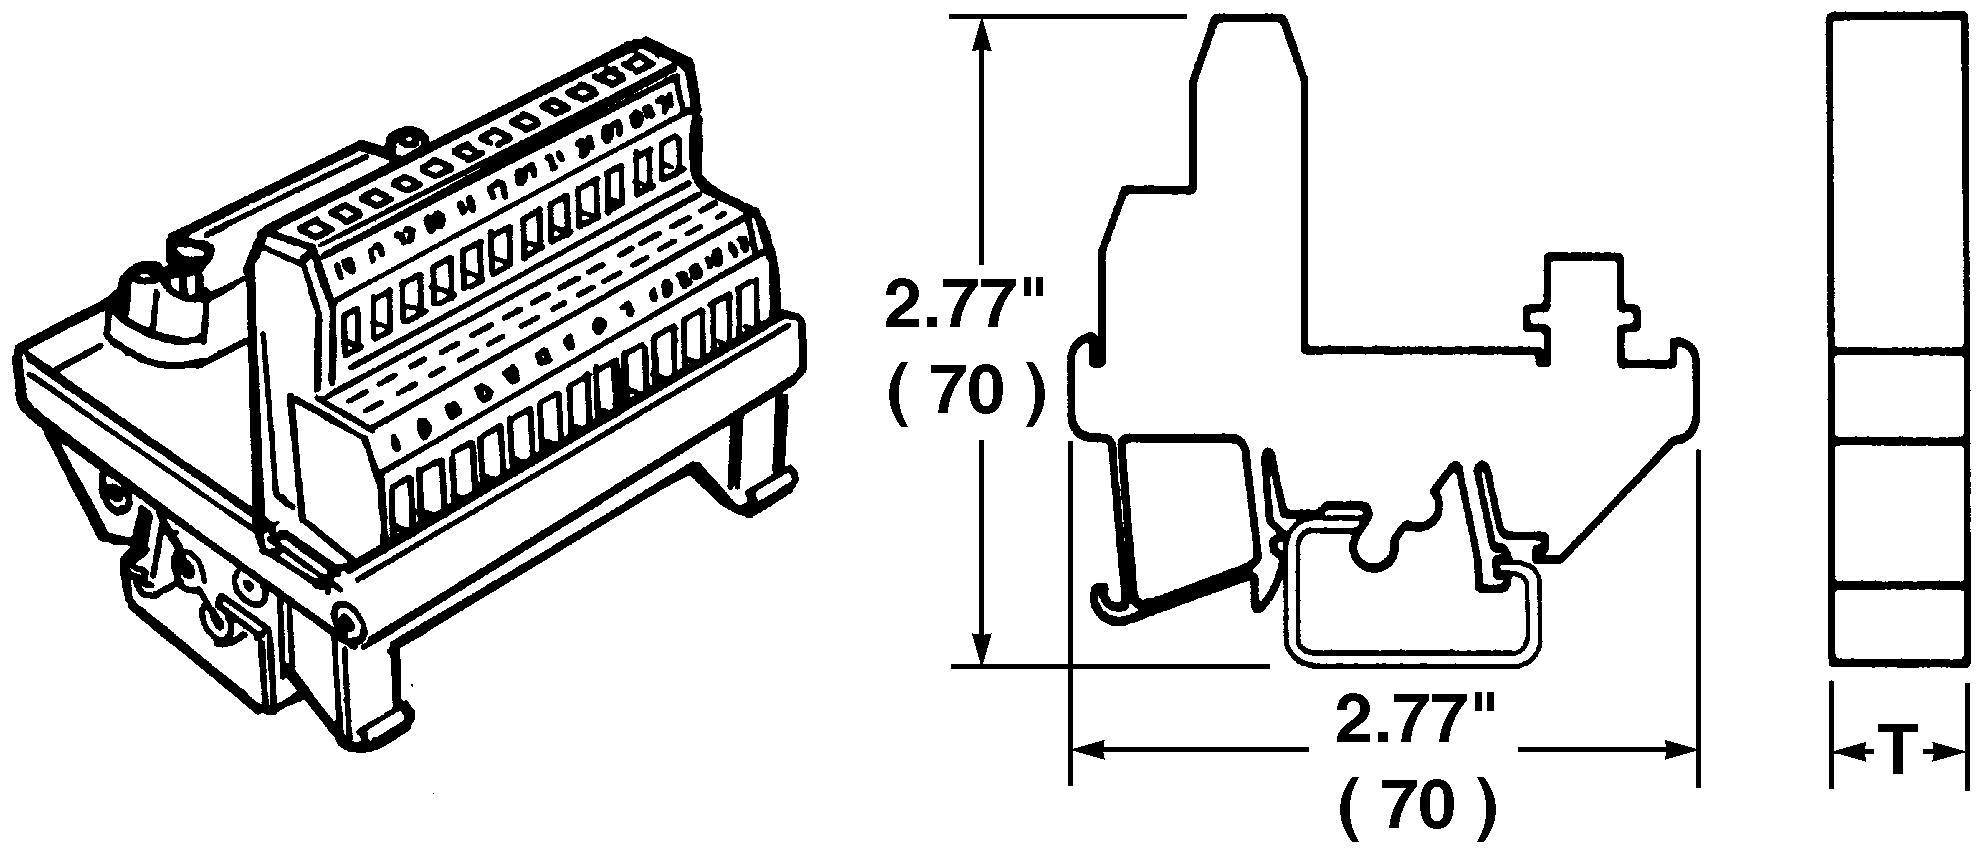 Weidmuller Terminal Block Interface D Sub 9